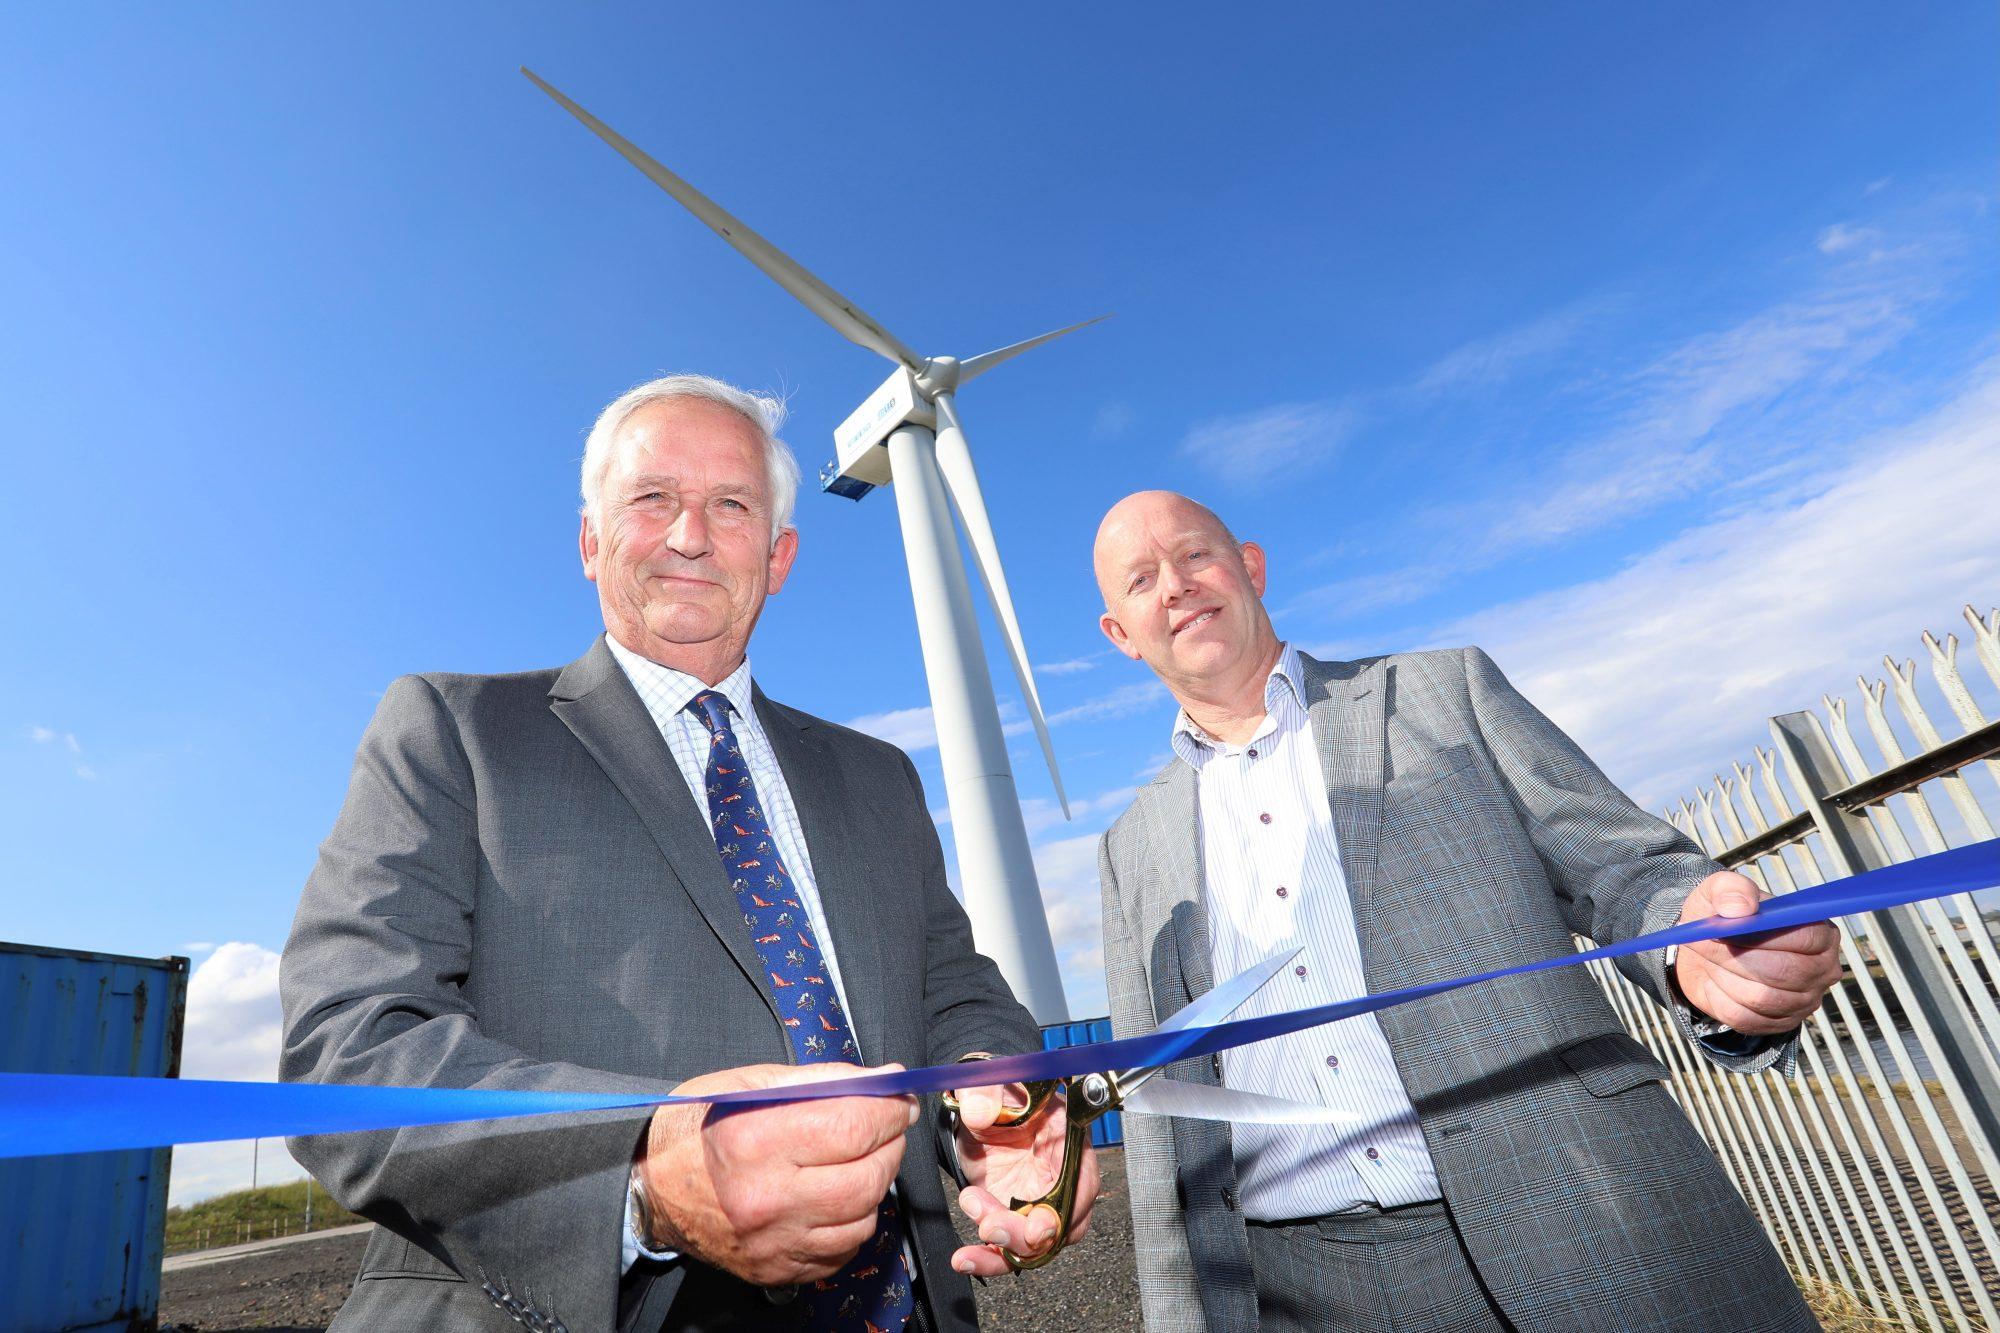 Wind Turbine Training Facility opening